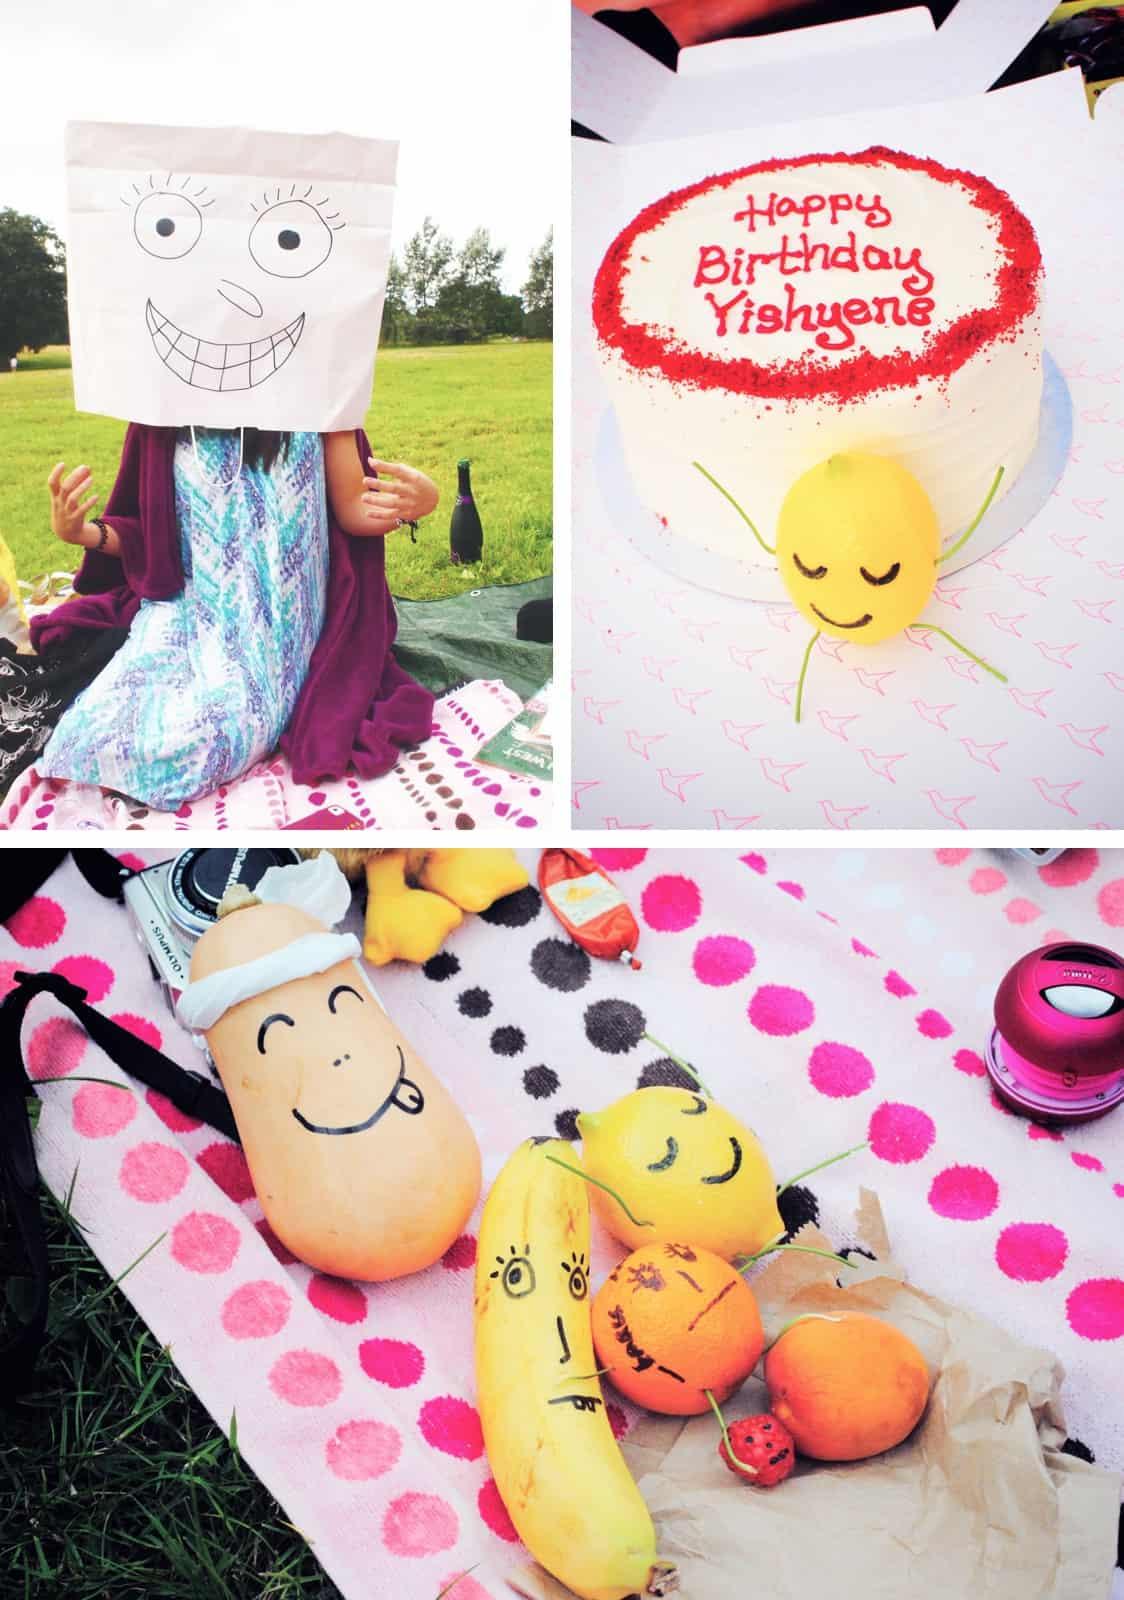 Fruits picnic